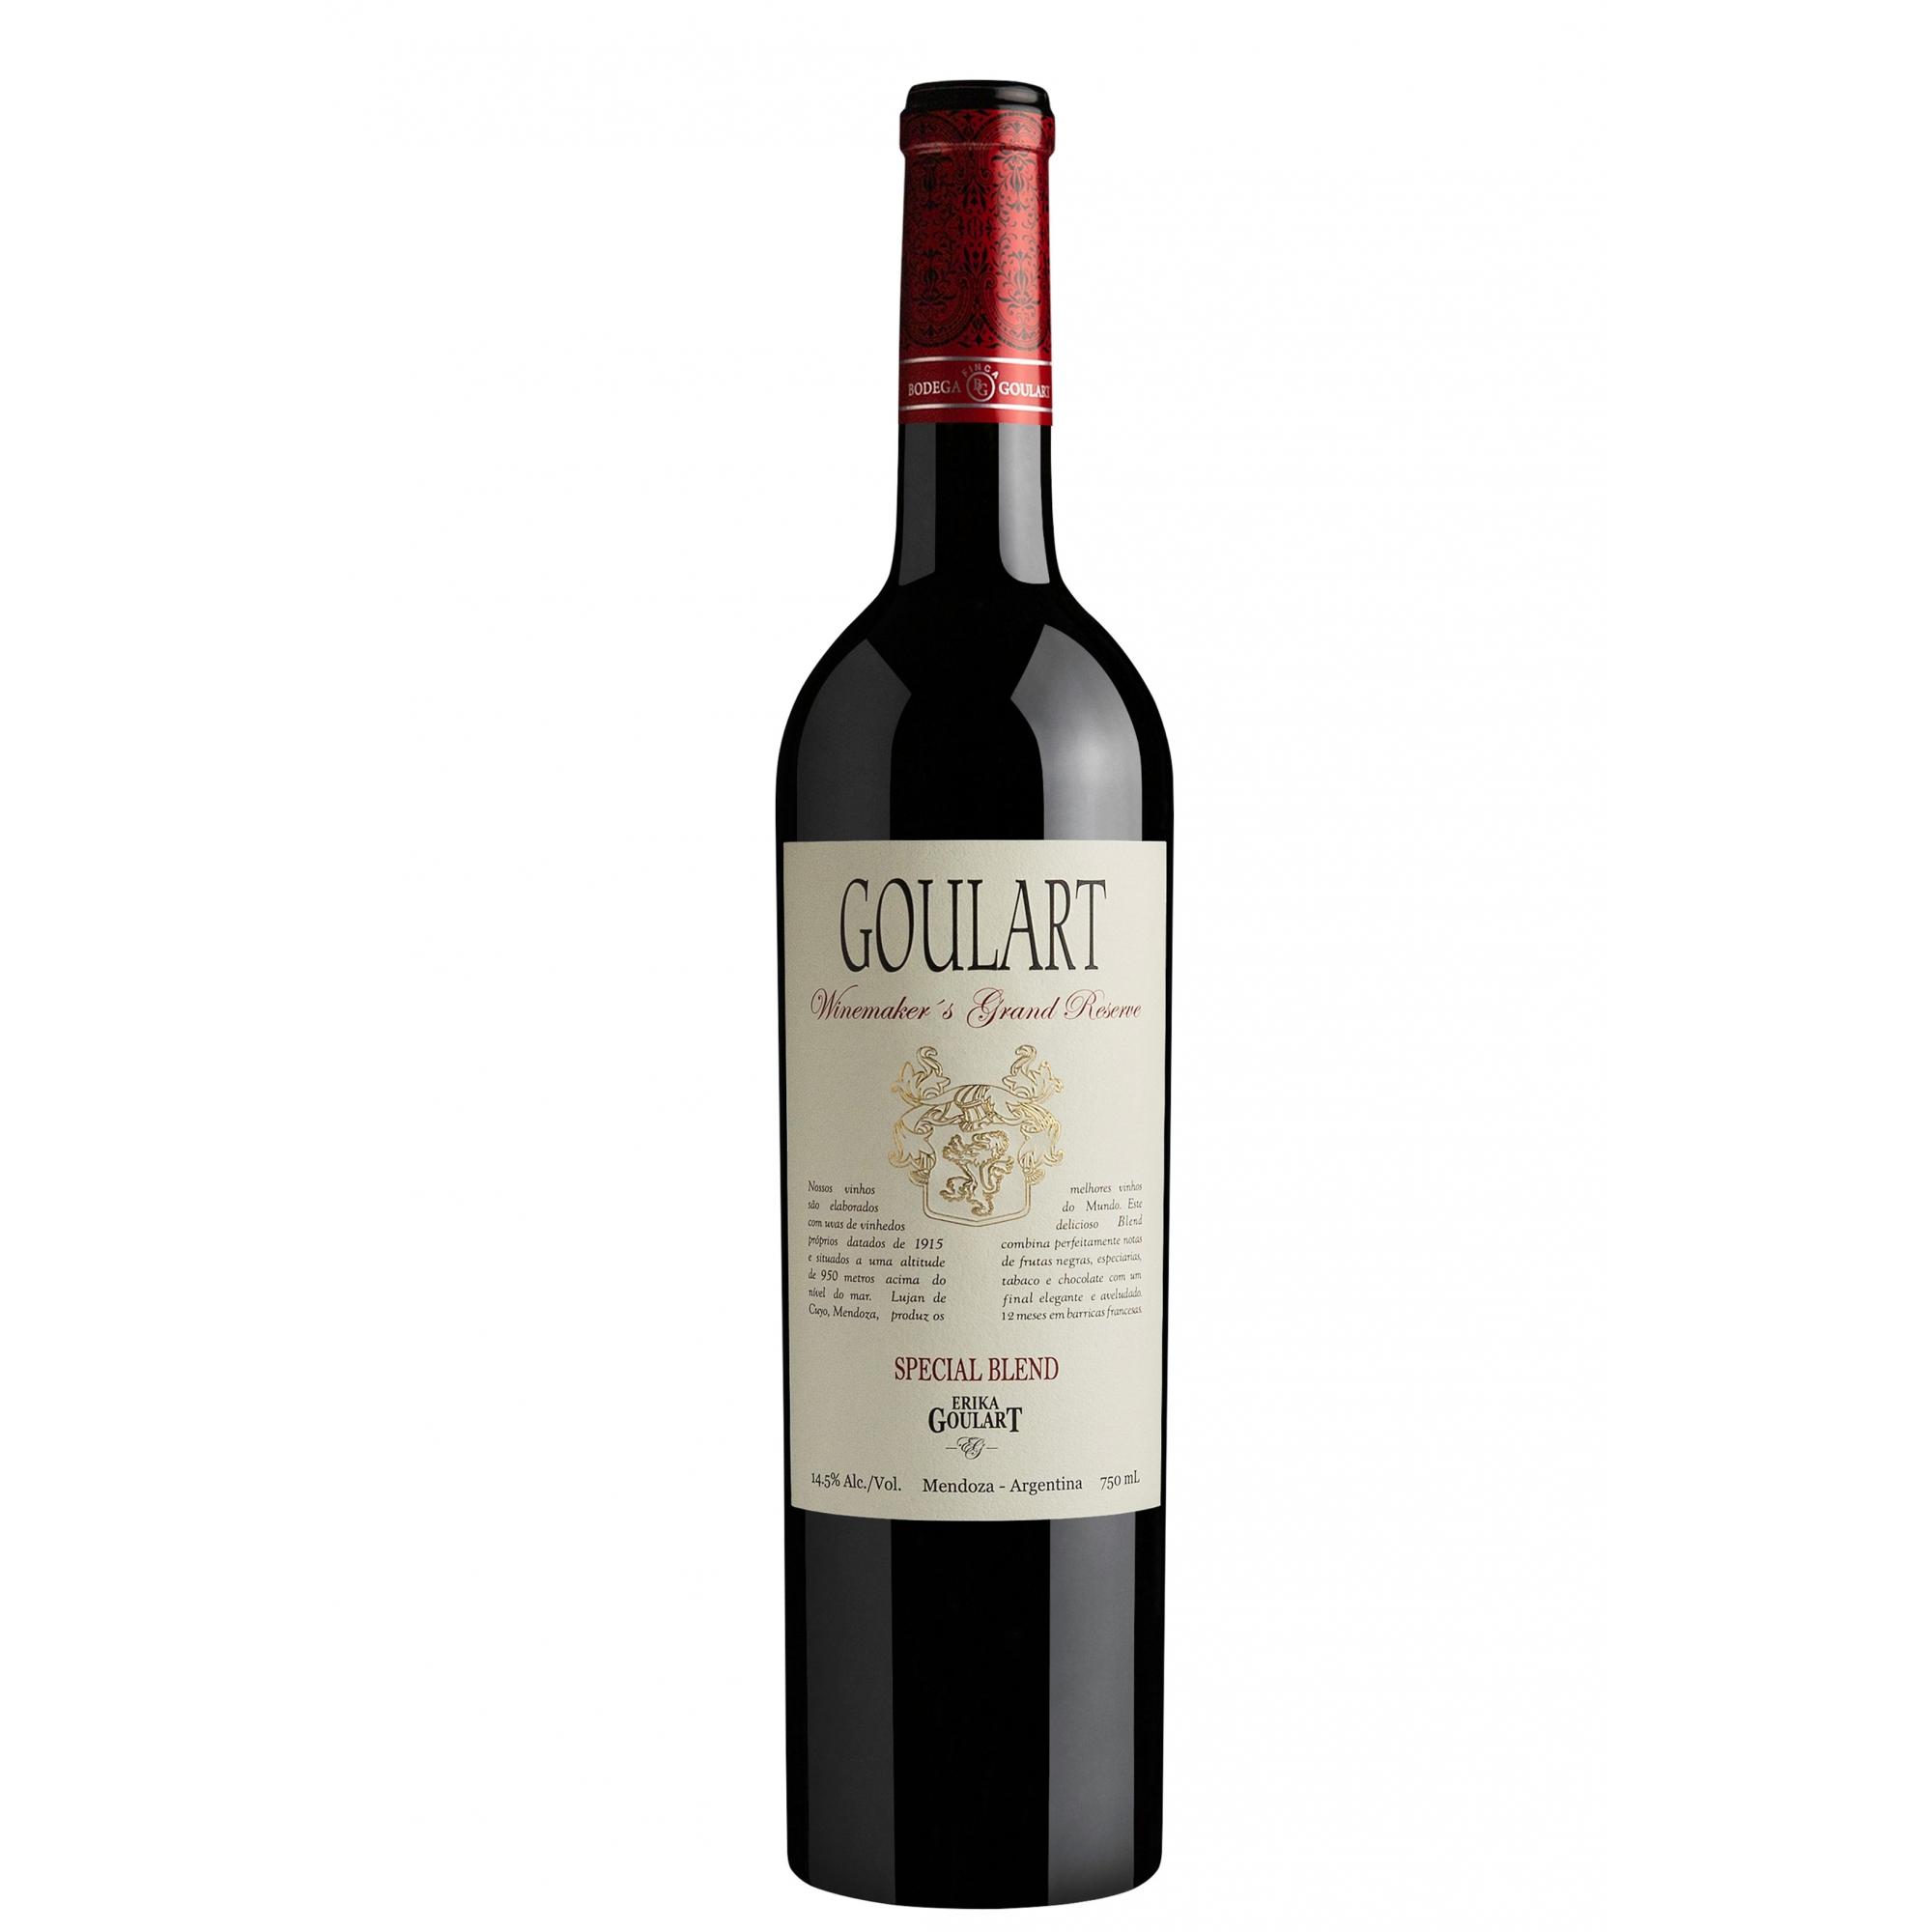 Goulart Winemaker´s Grand Reserve Special Blend 2017 - 750ml